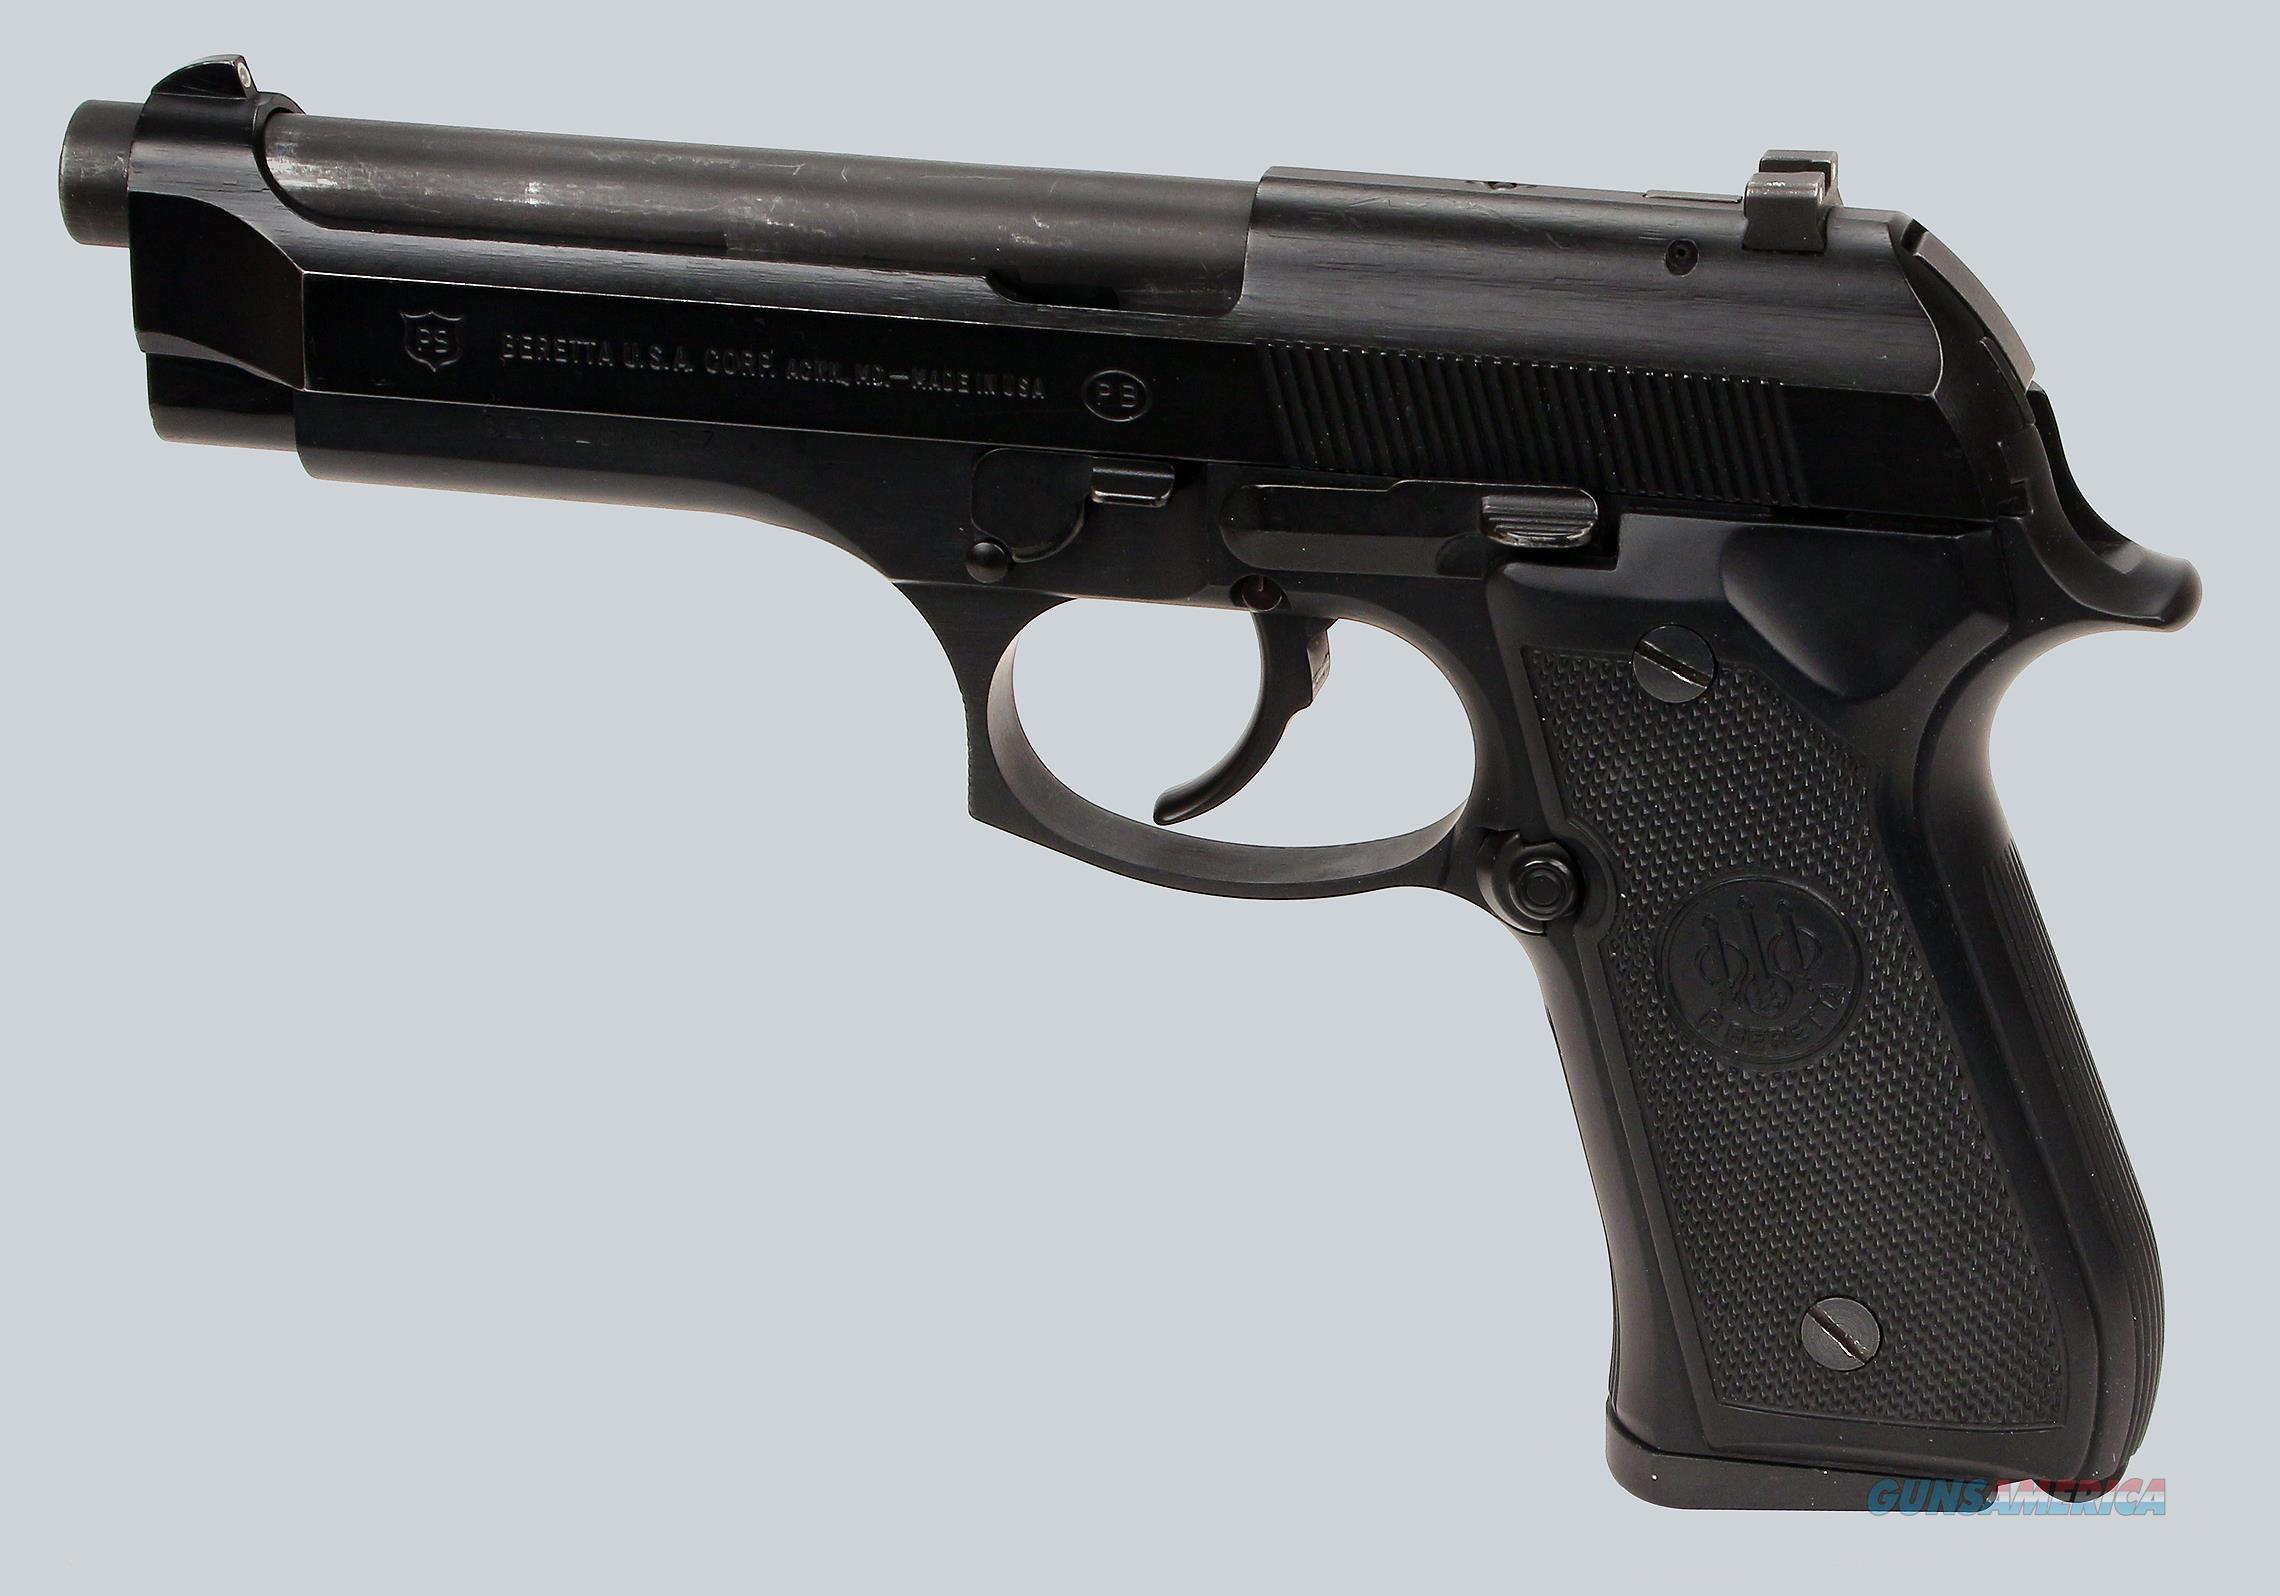 Beretta 9mm 92D Pistol  Guns > Pistols > Beretta Pistols > Model 92 Series